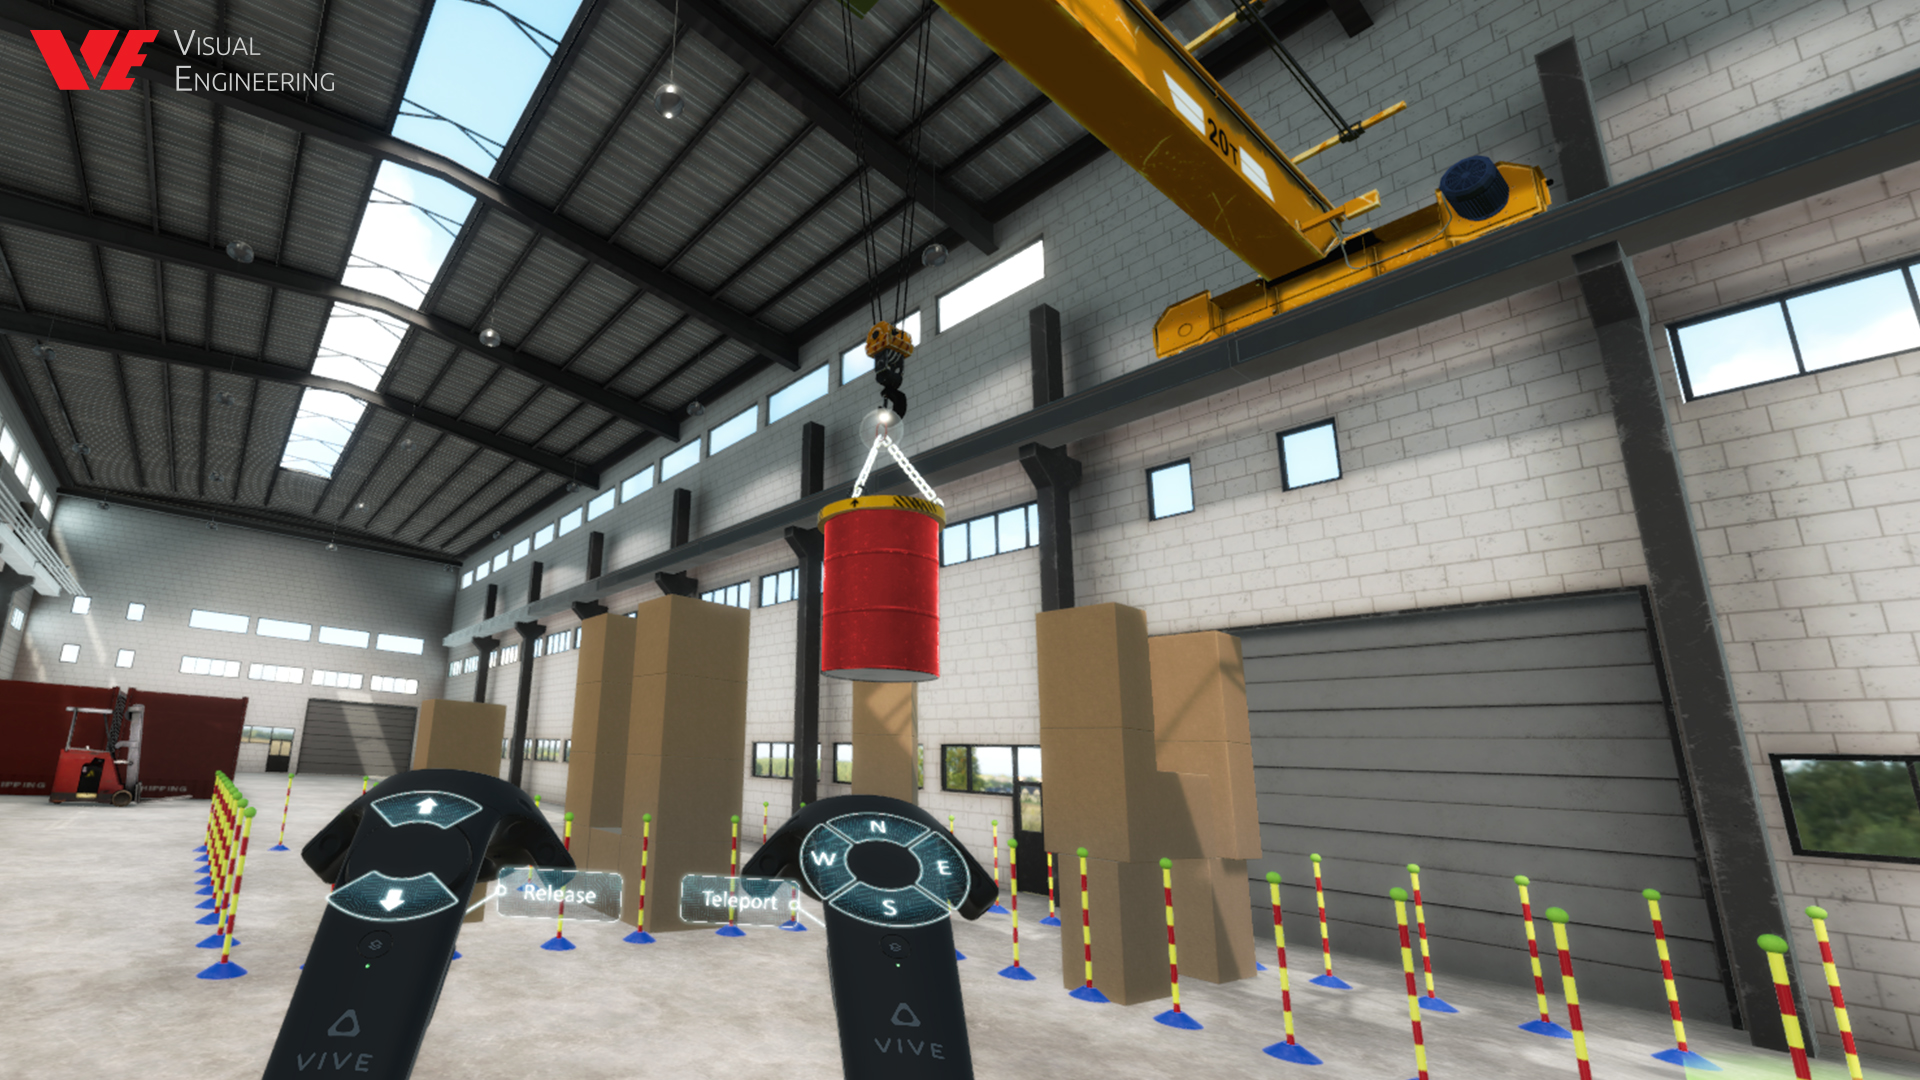 VE-G-SIM-Overhead-Crane-Simulator-Visualization Our Work